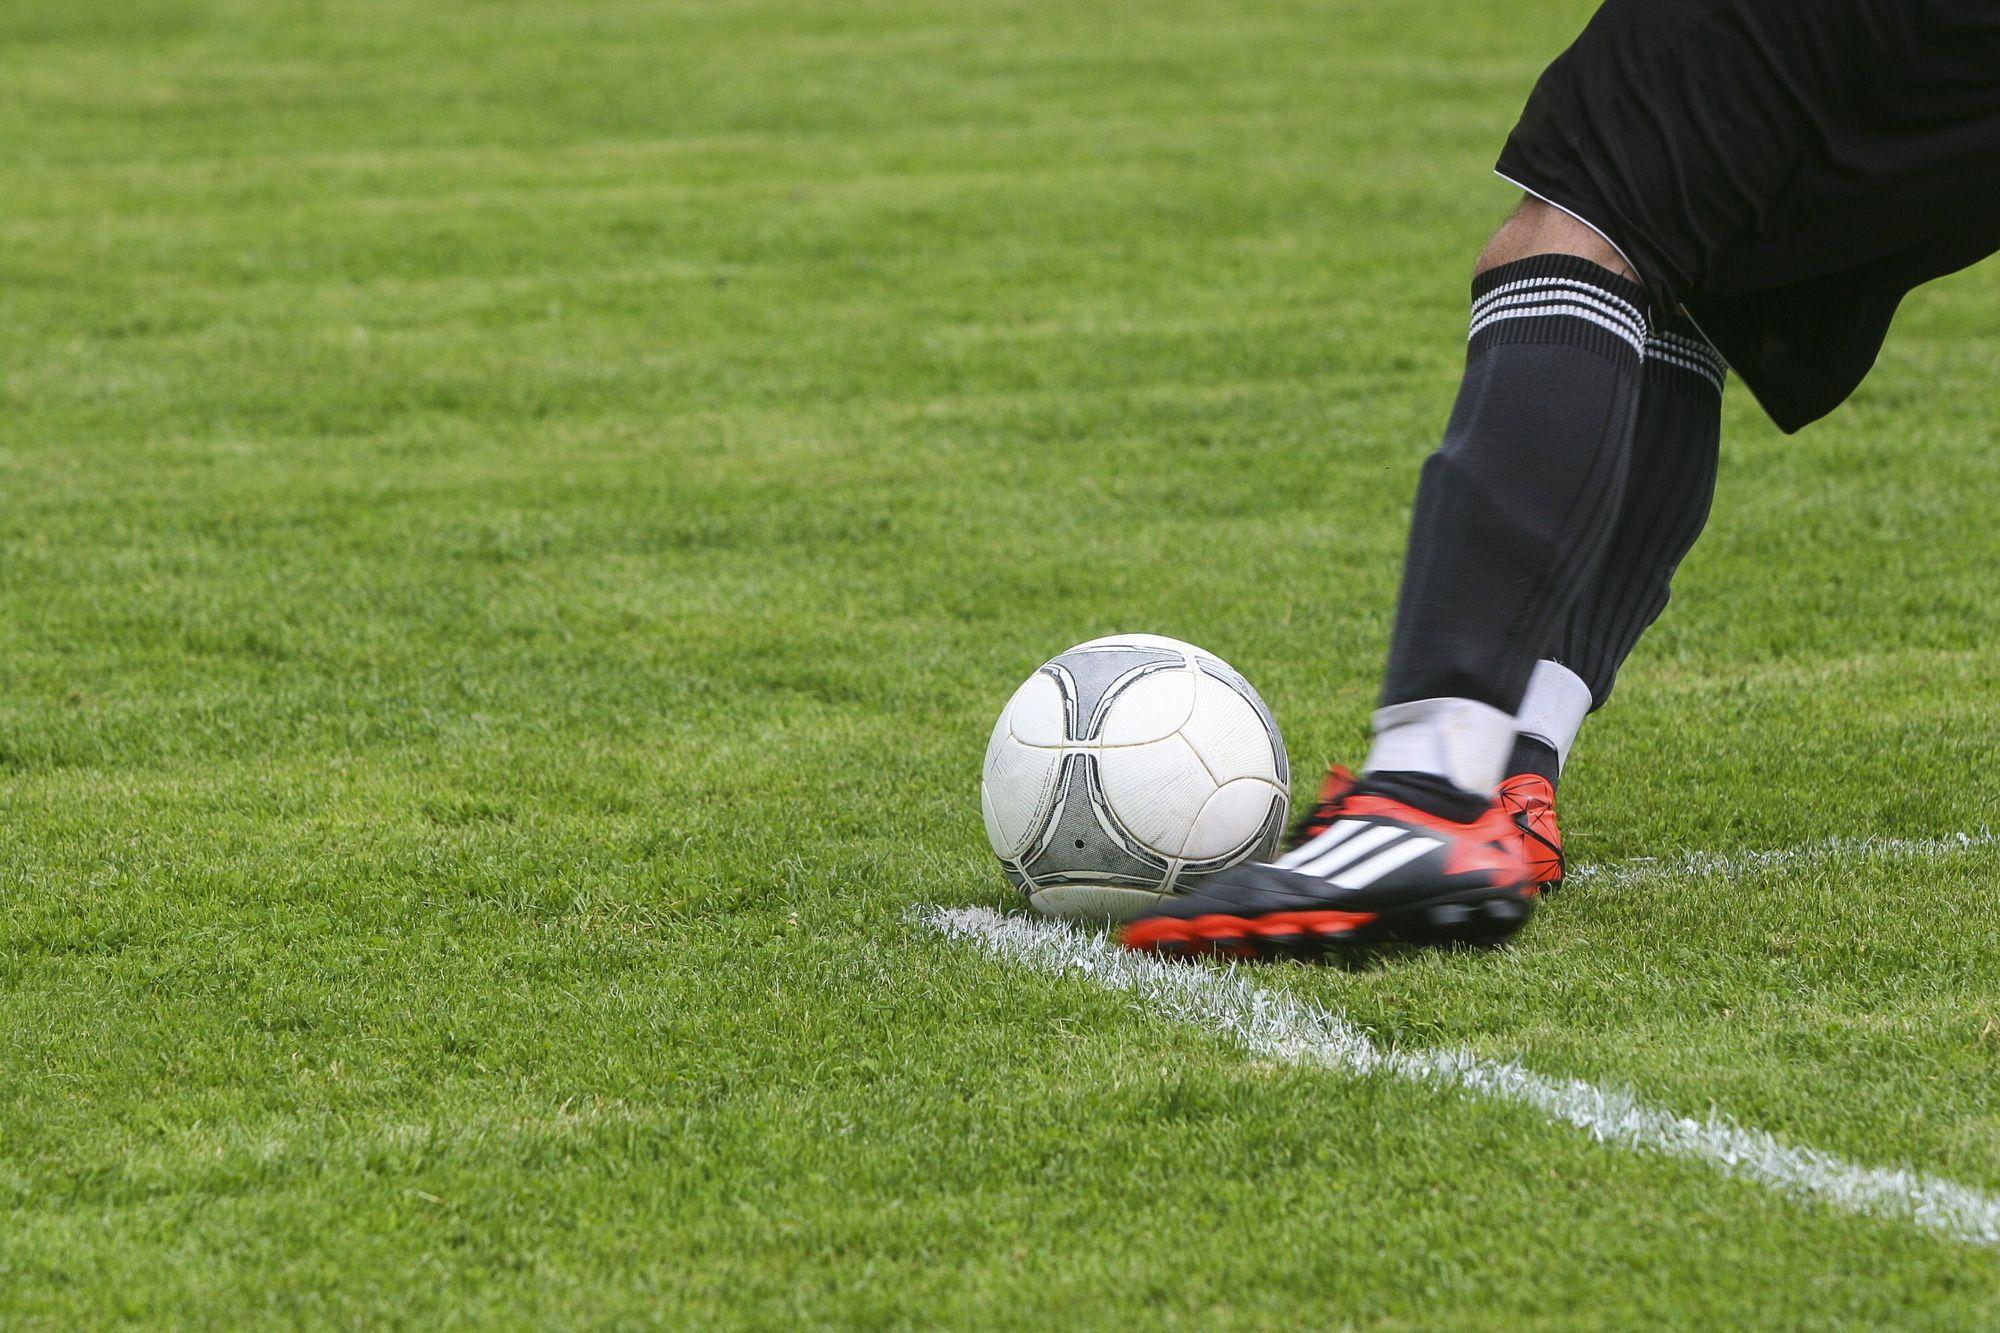 Calcio: la schedina del lunedì - 02/11/2020